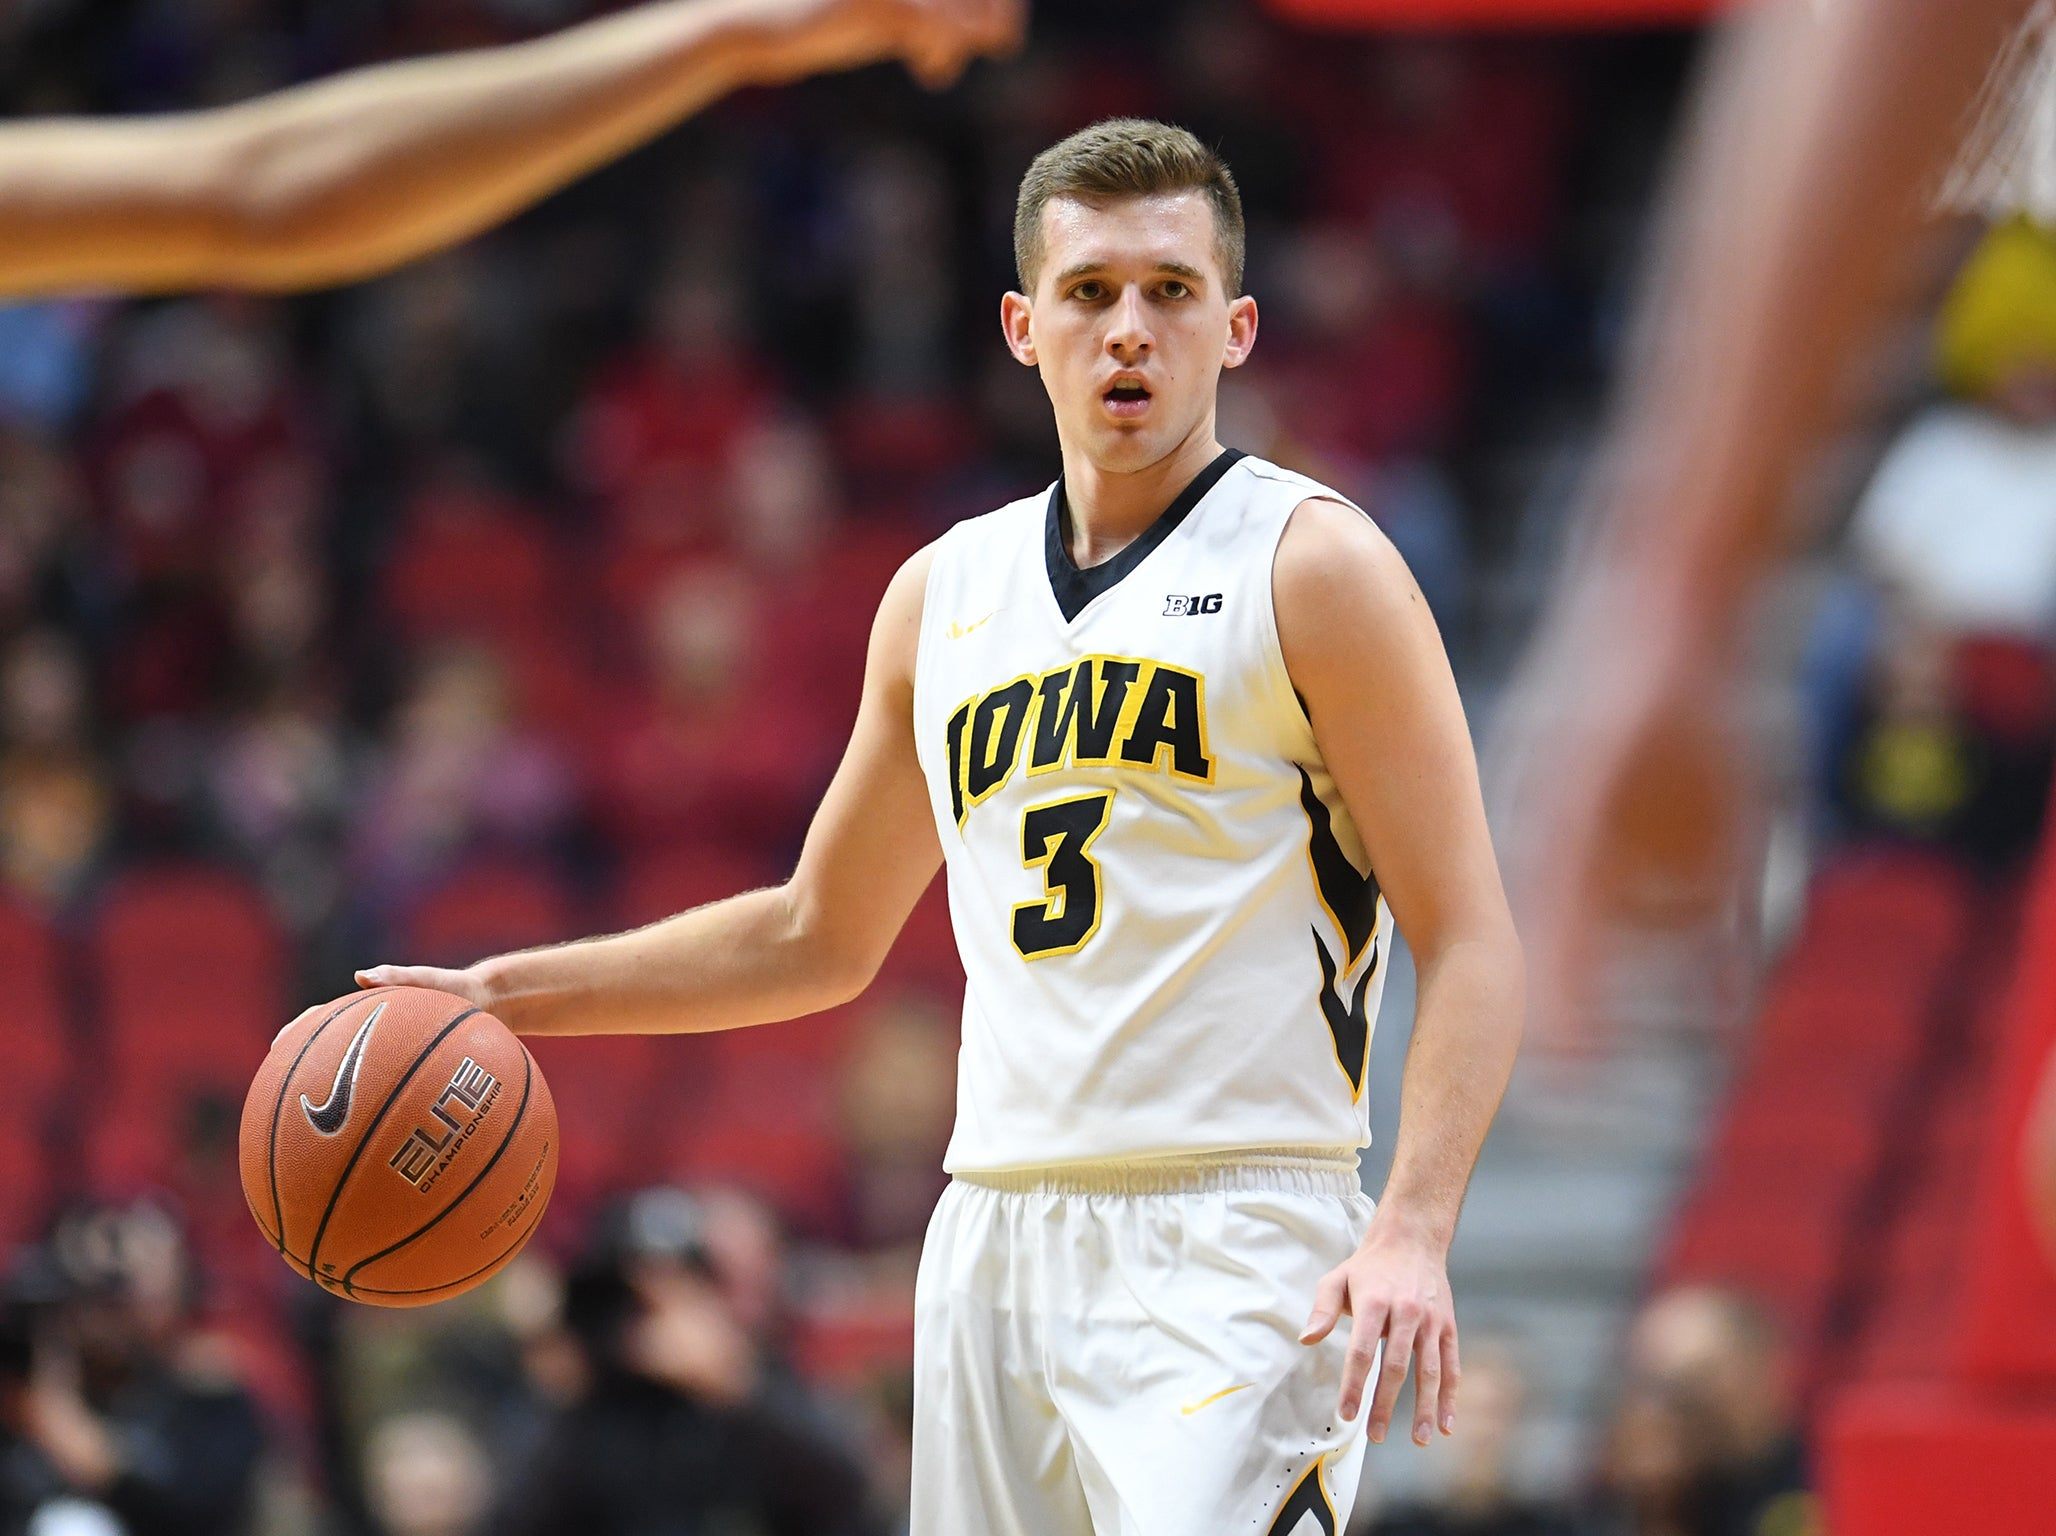 Iowa basketball star Jordan Bohannon deliberately misses ...